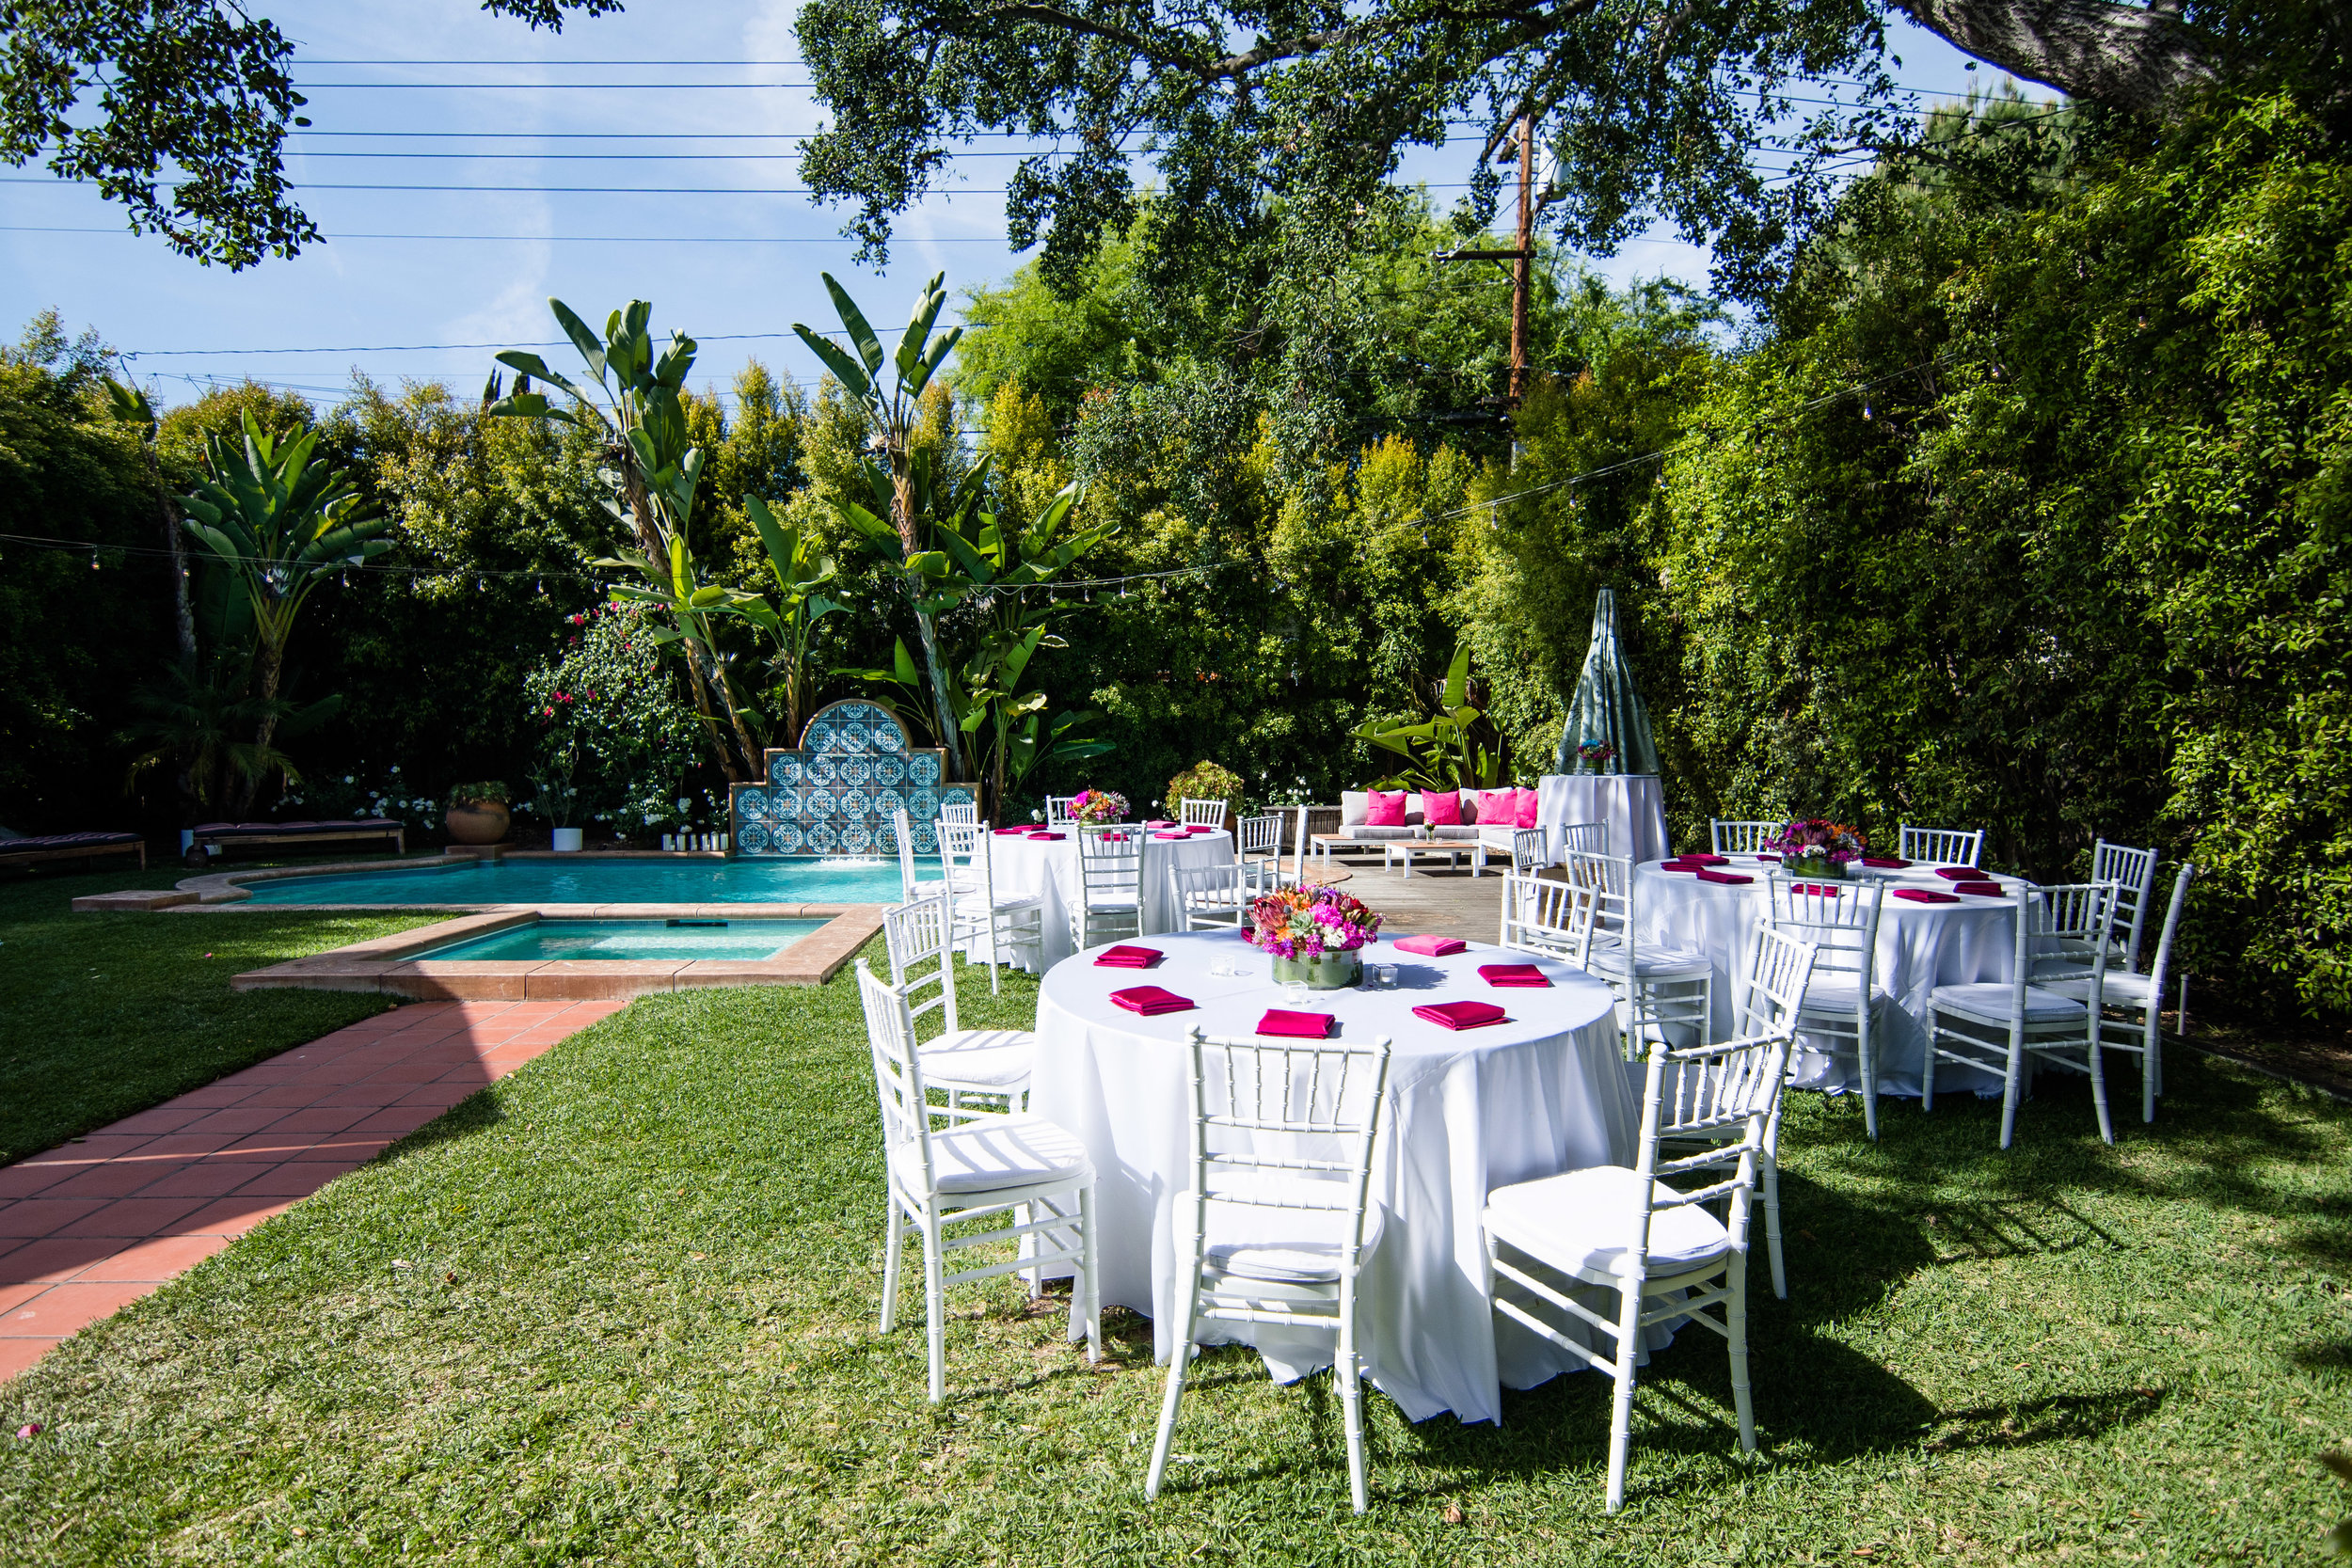 Vibrant Fiesta Backyard Wedding Reception lush greens and beautiful pool perfect wedding backdrop.jpg